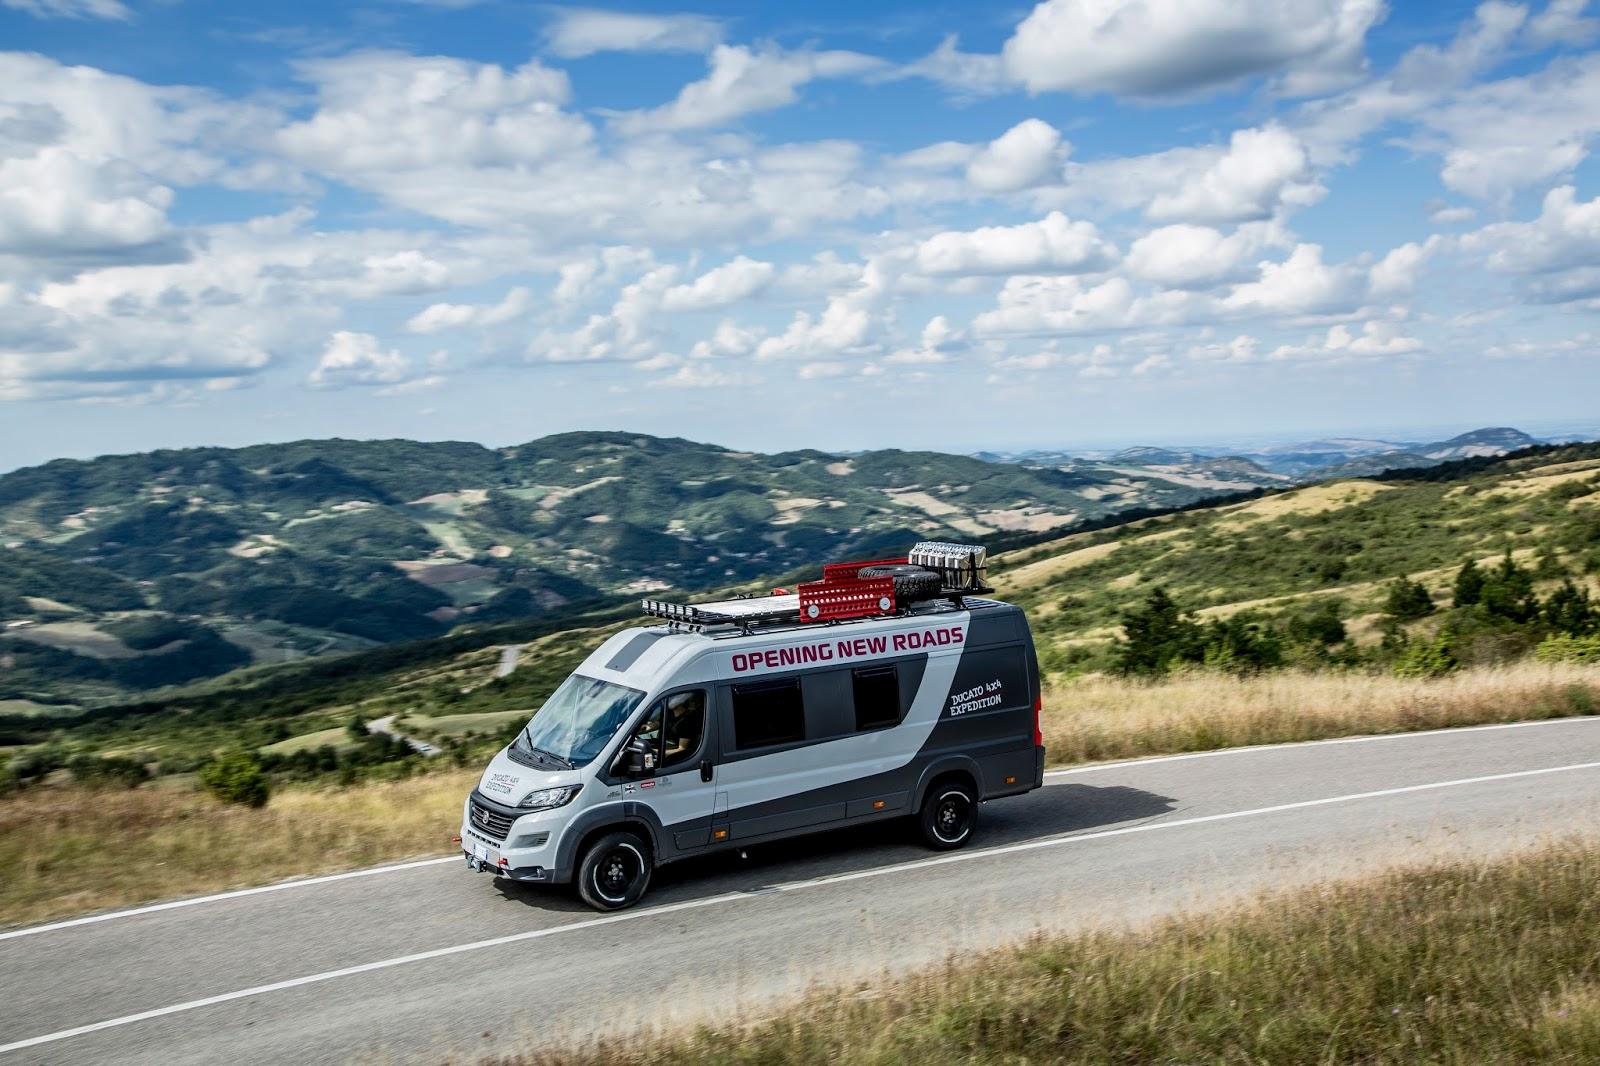 Fiat Ducato Camper Van 4x4 Expedition